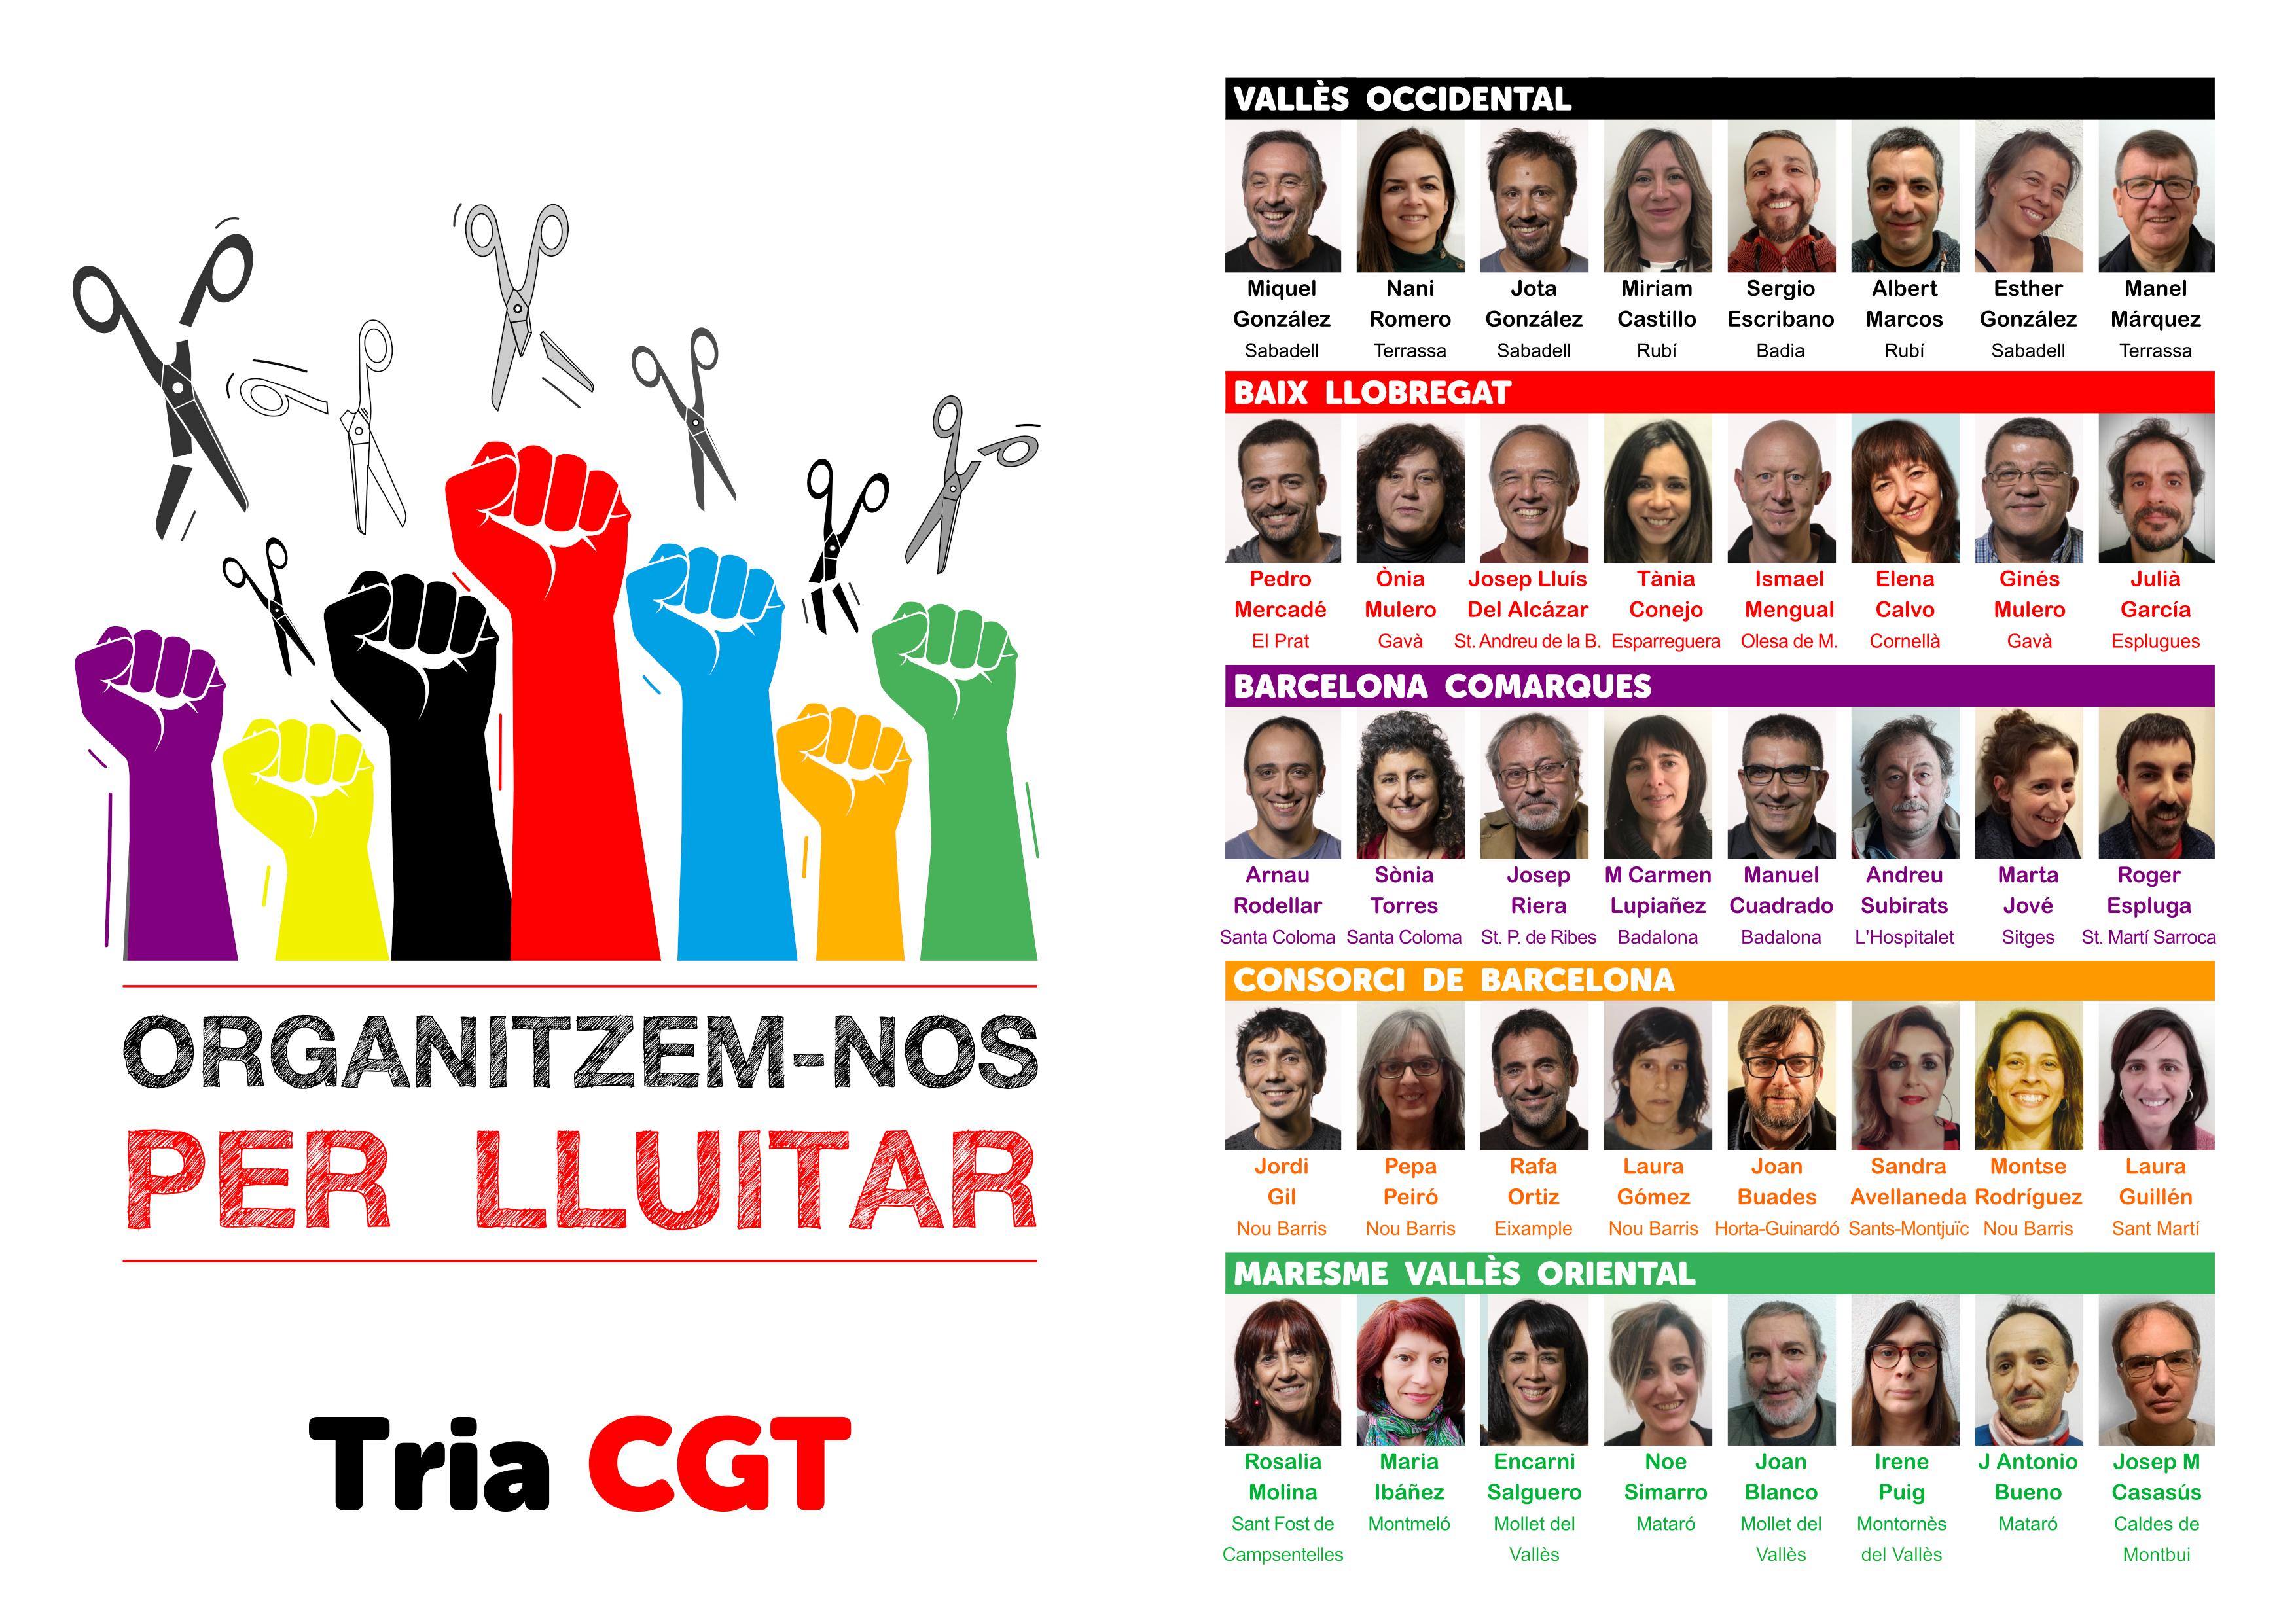 tria_cgt.png